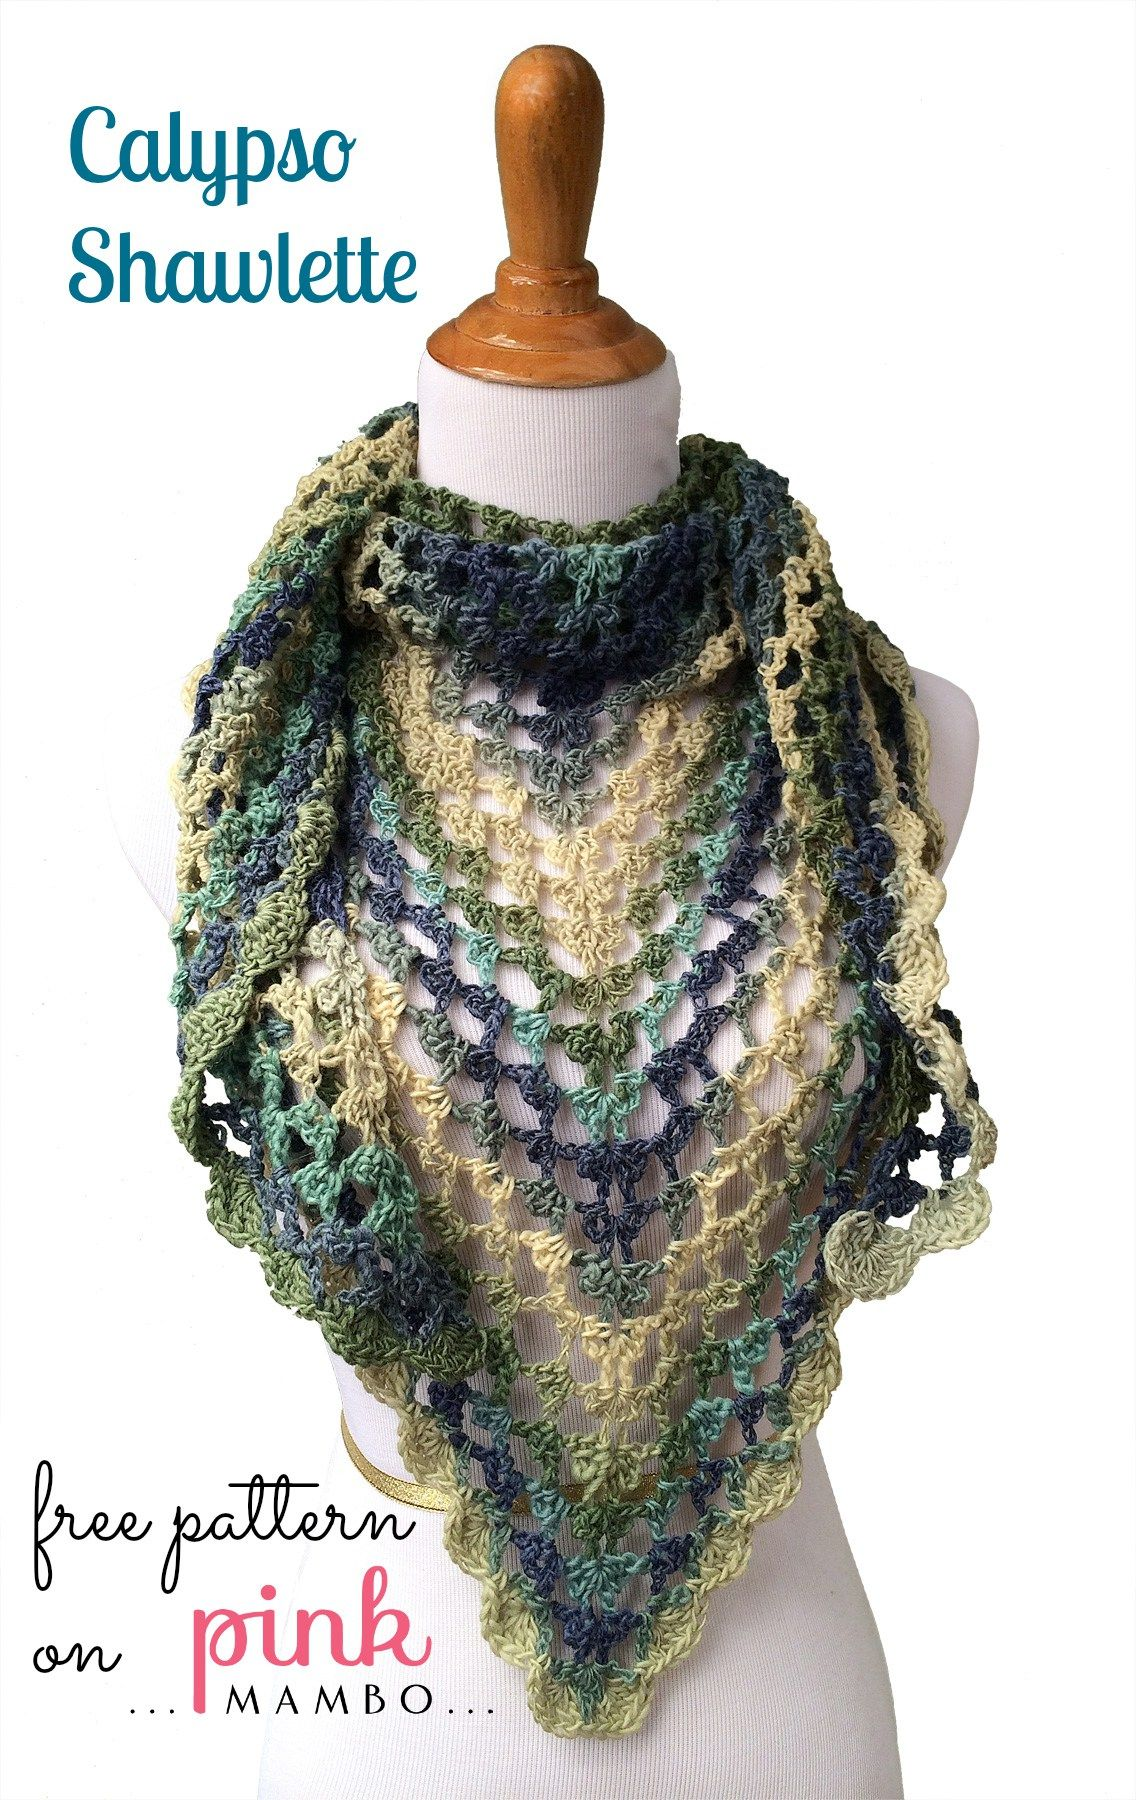 Calypso Crochet Shawlette Crafts Pinterest Häkeln Tuch Häkeln